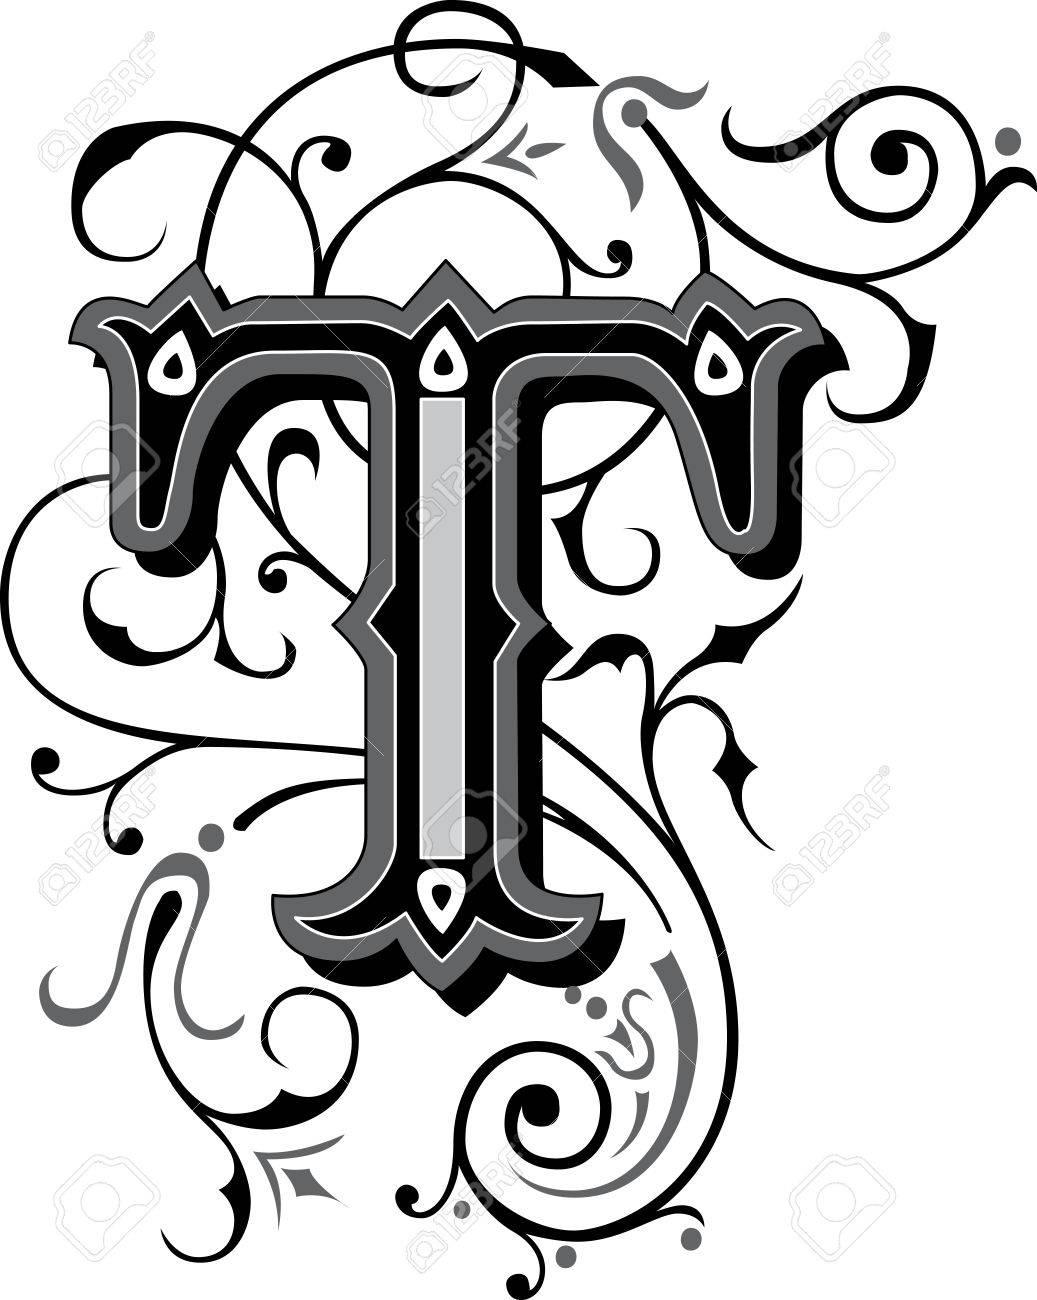 красивая буква с картинка